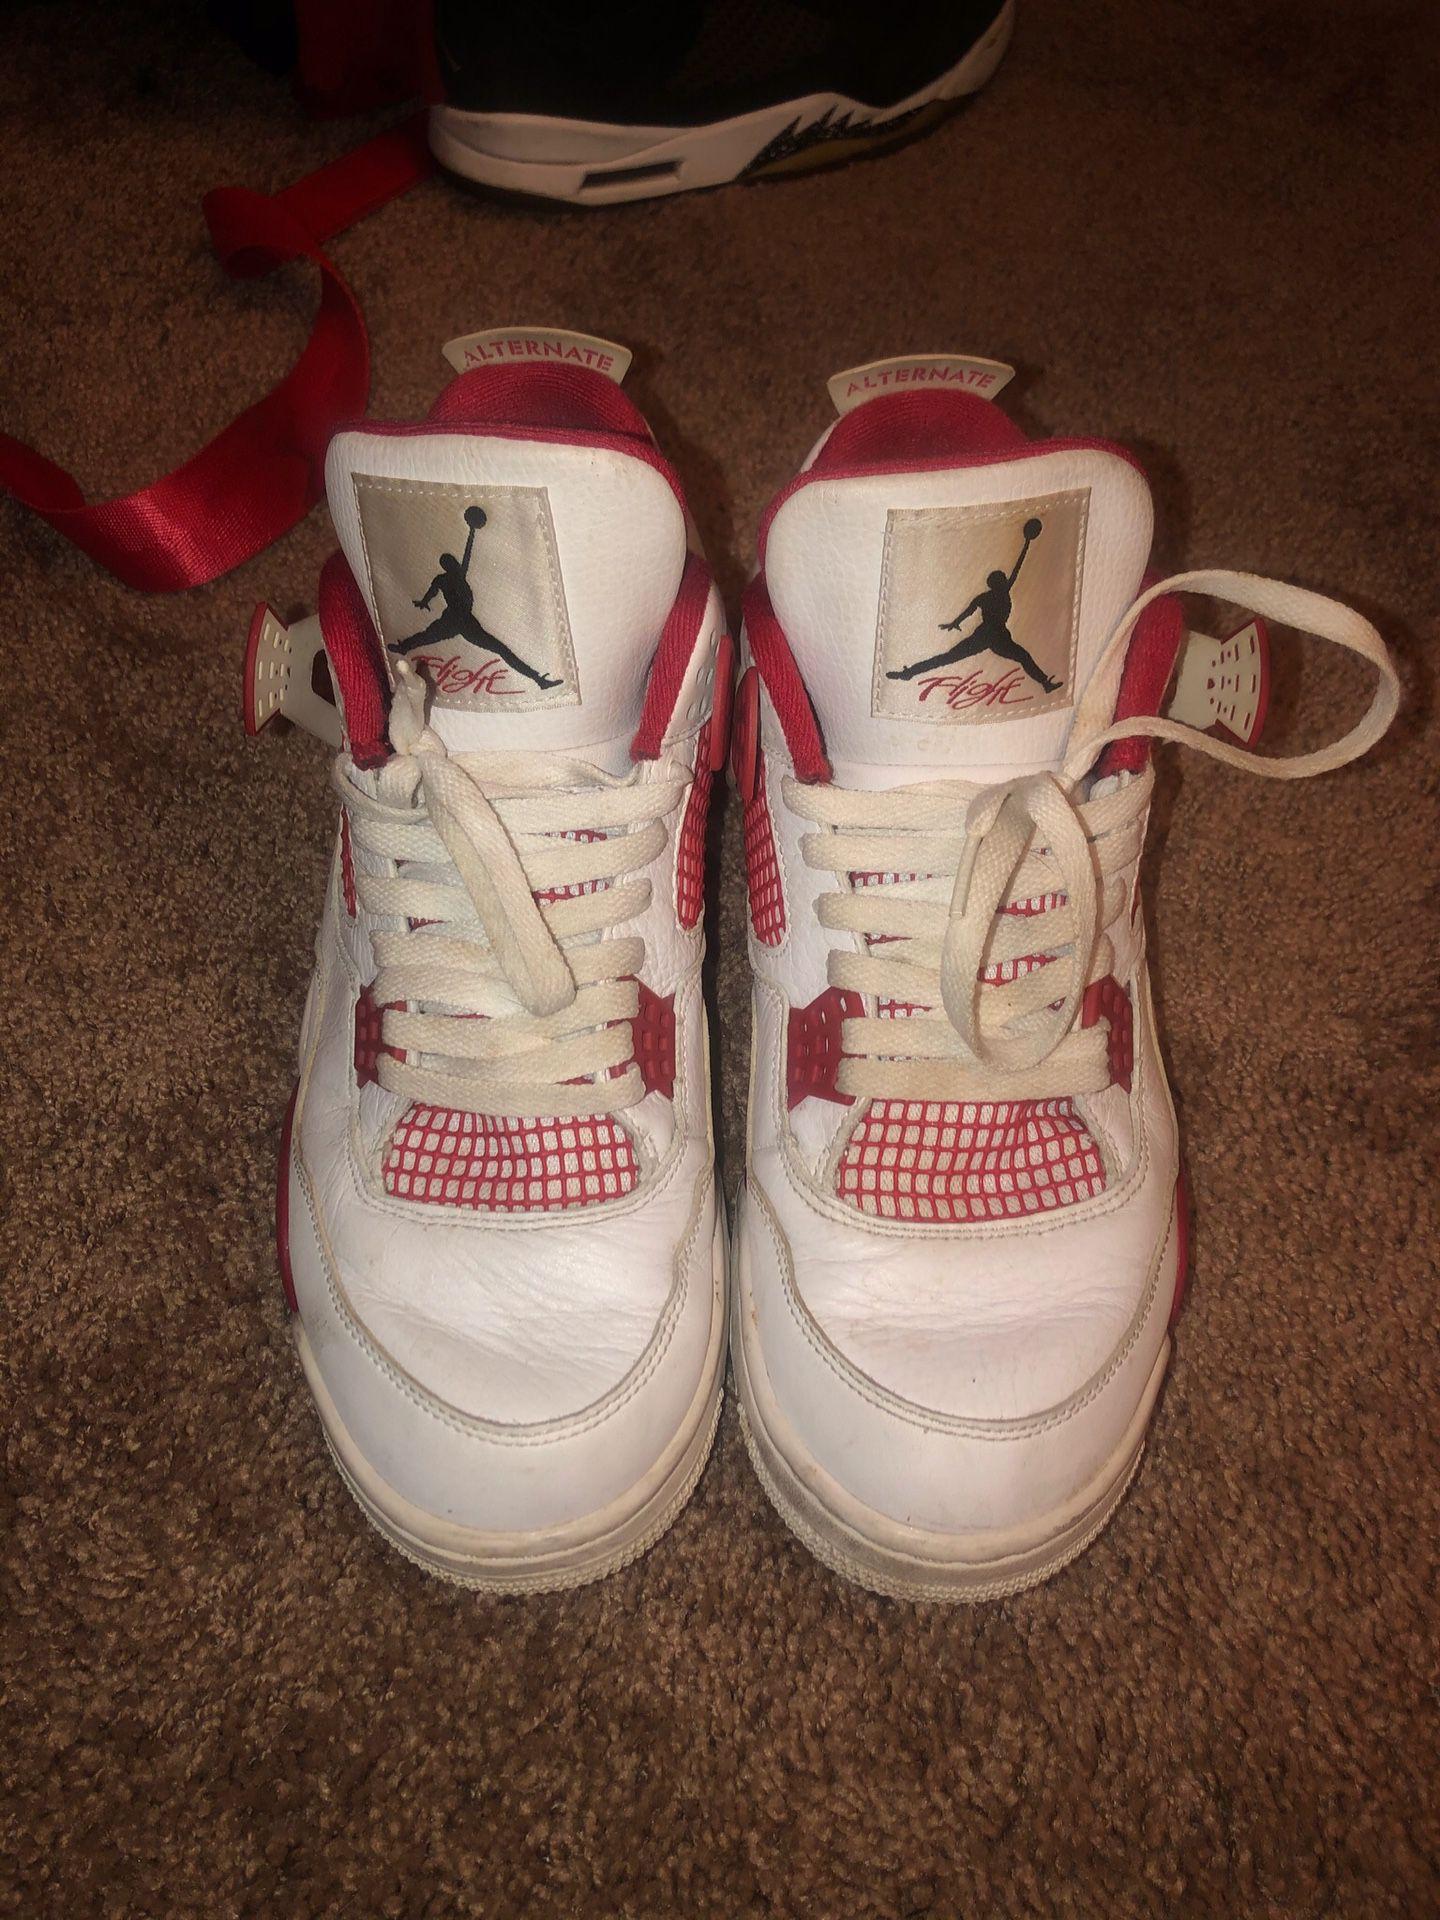 Air Jordan retro 4 size 10.5